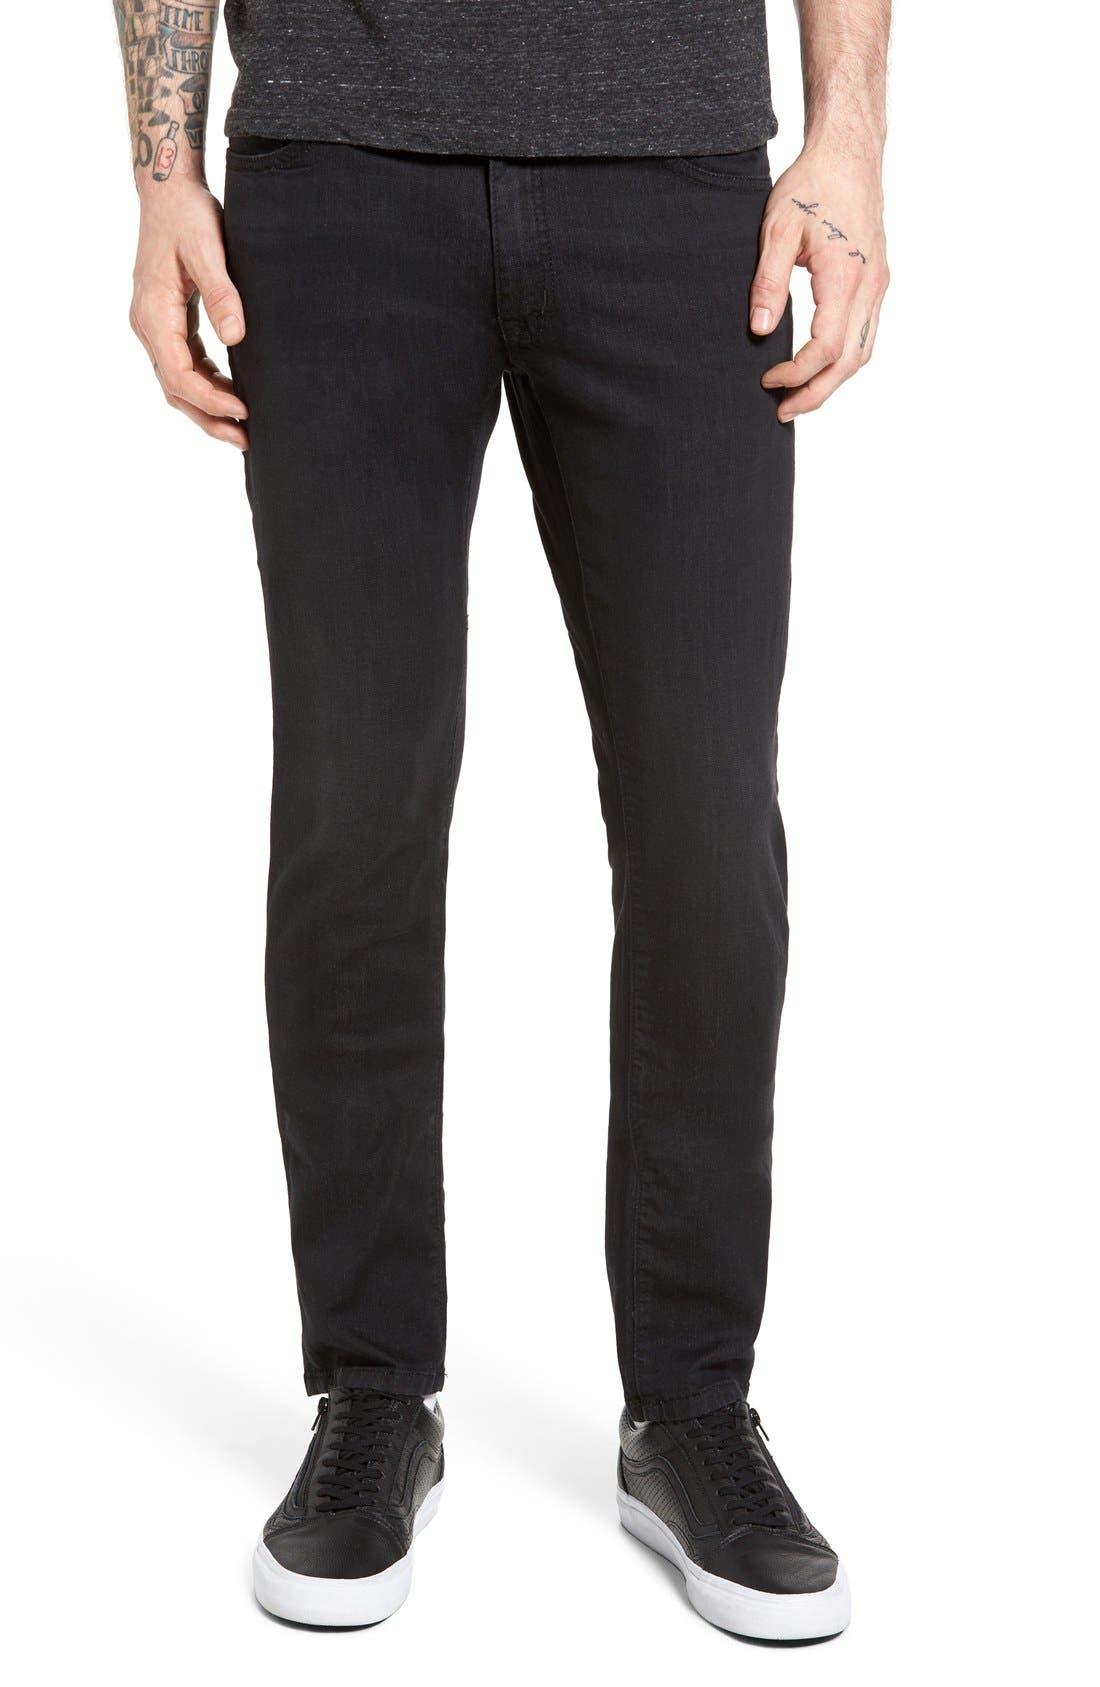 Torino Slim Fit Jeans,                         Main,                         color, Raven Black